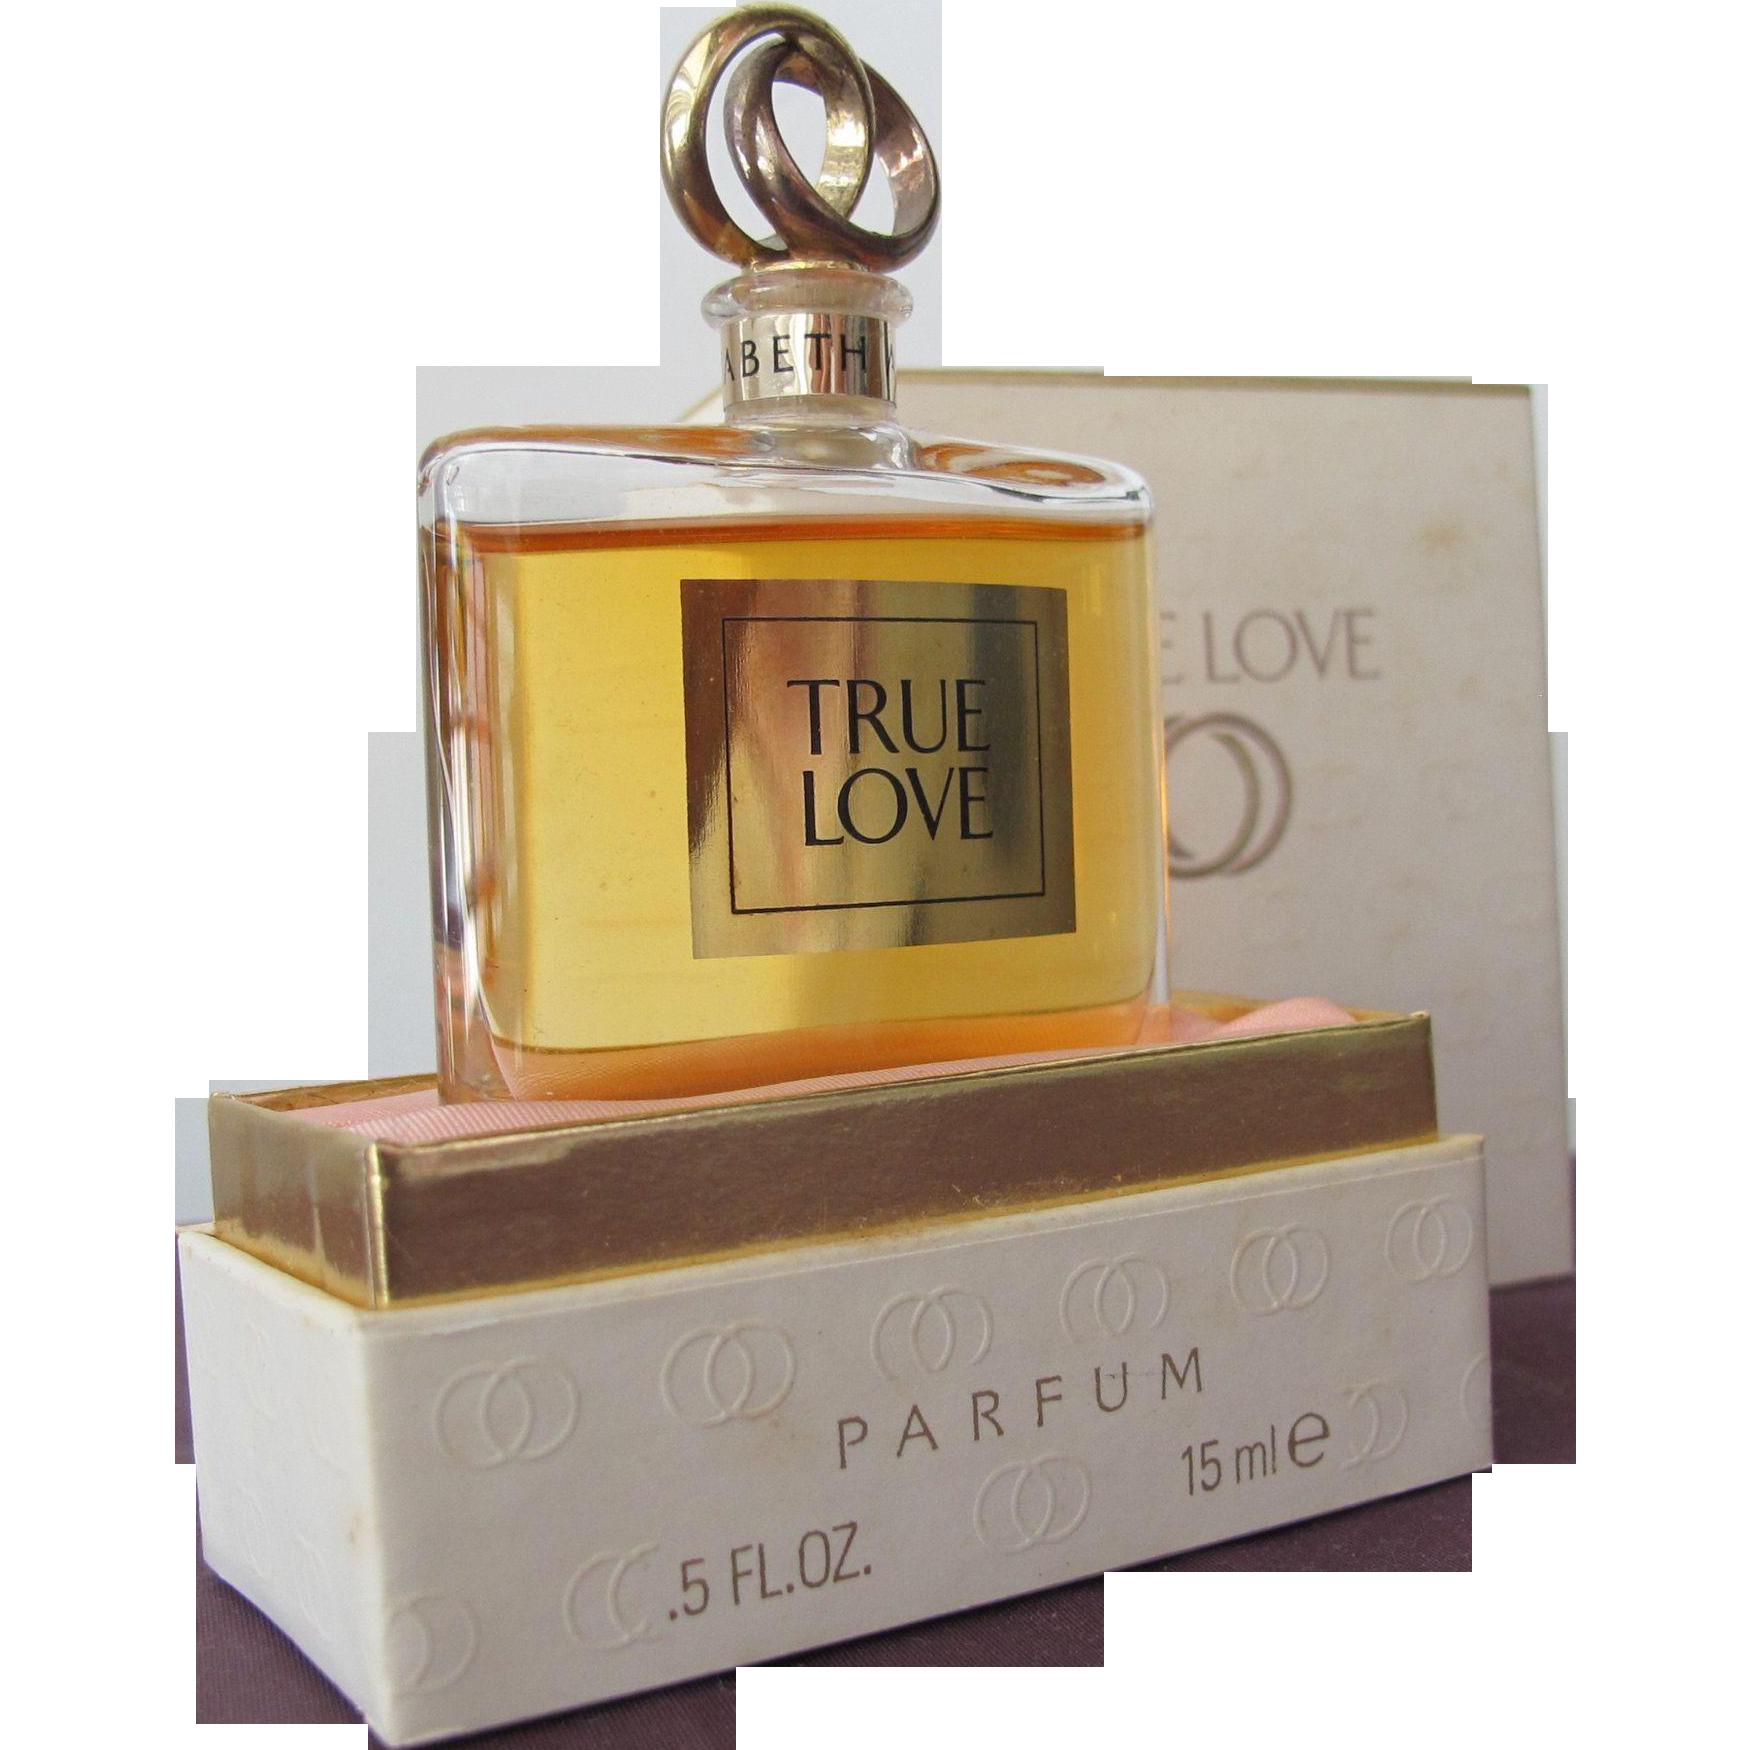 Elizabeth Arden Vintage Perfume Bottle True Love with Wedding Ring